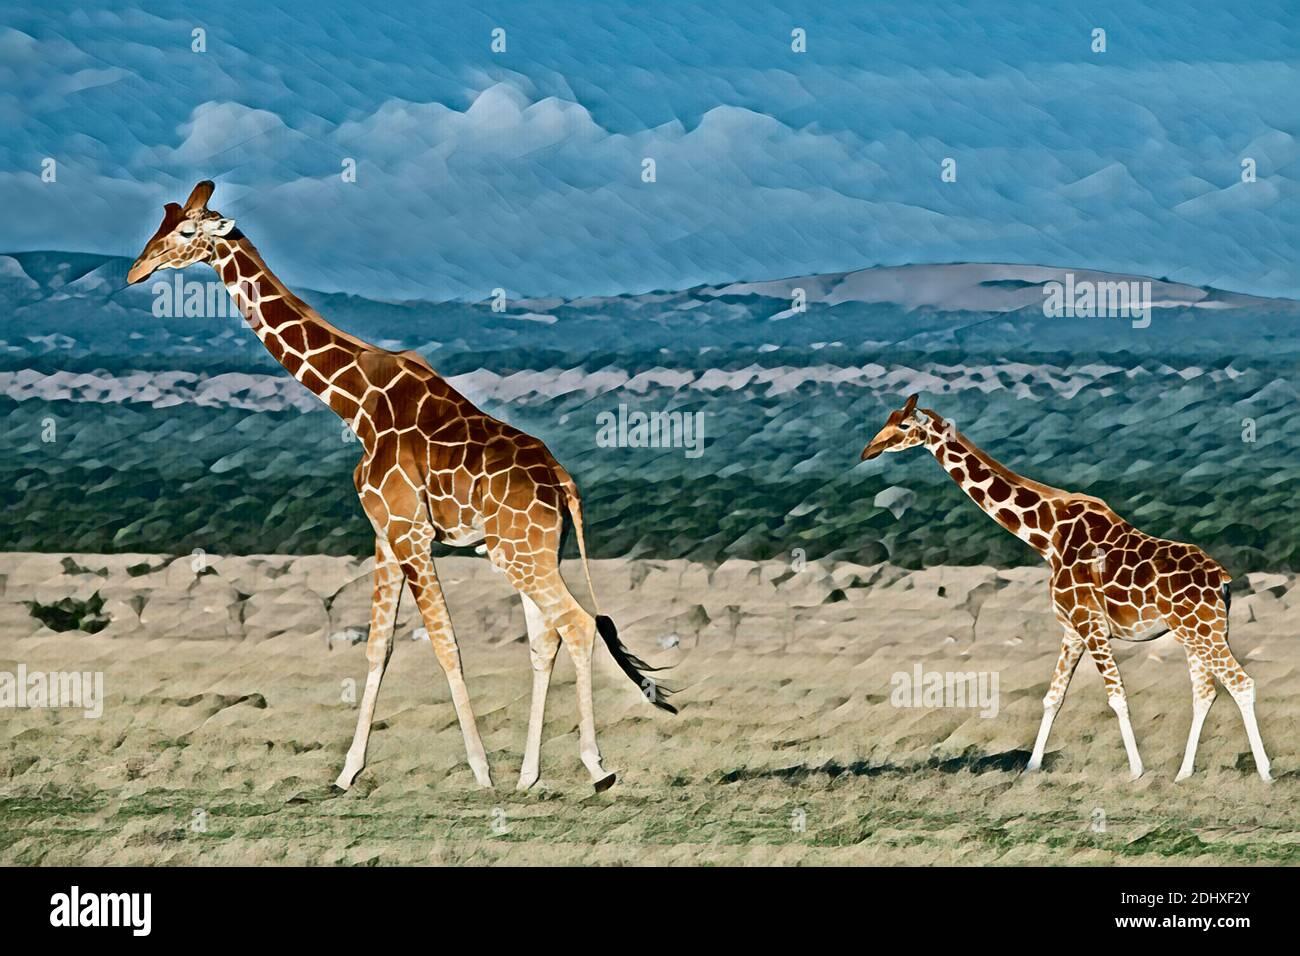 Afrique, Kenya, girafes réticulés (SAUVAGES : Giraffa camelopardalis reticulata). Banque D'Images